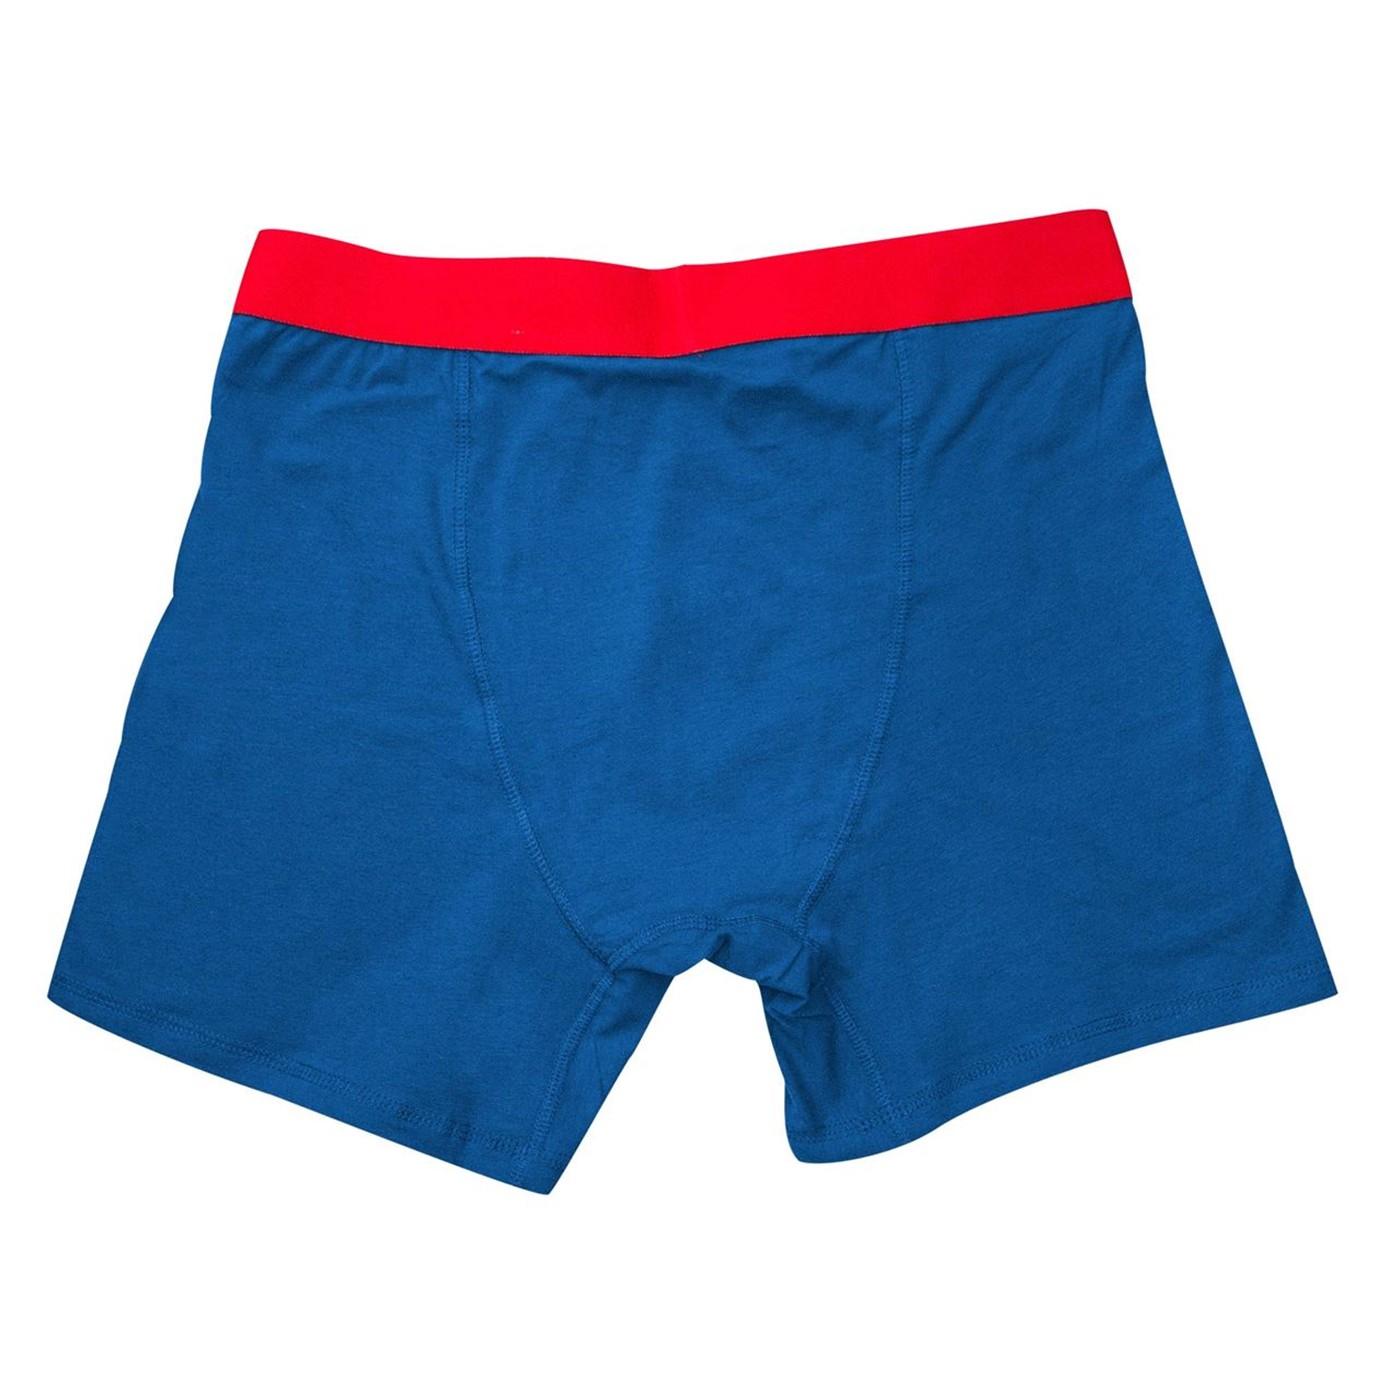 Superman Classic Men's Underwear Boxer Briefs